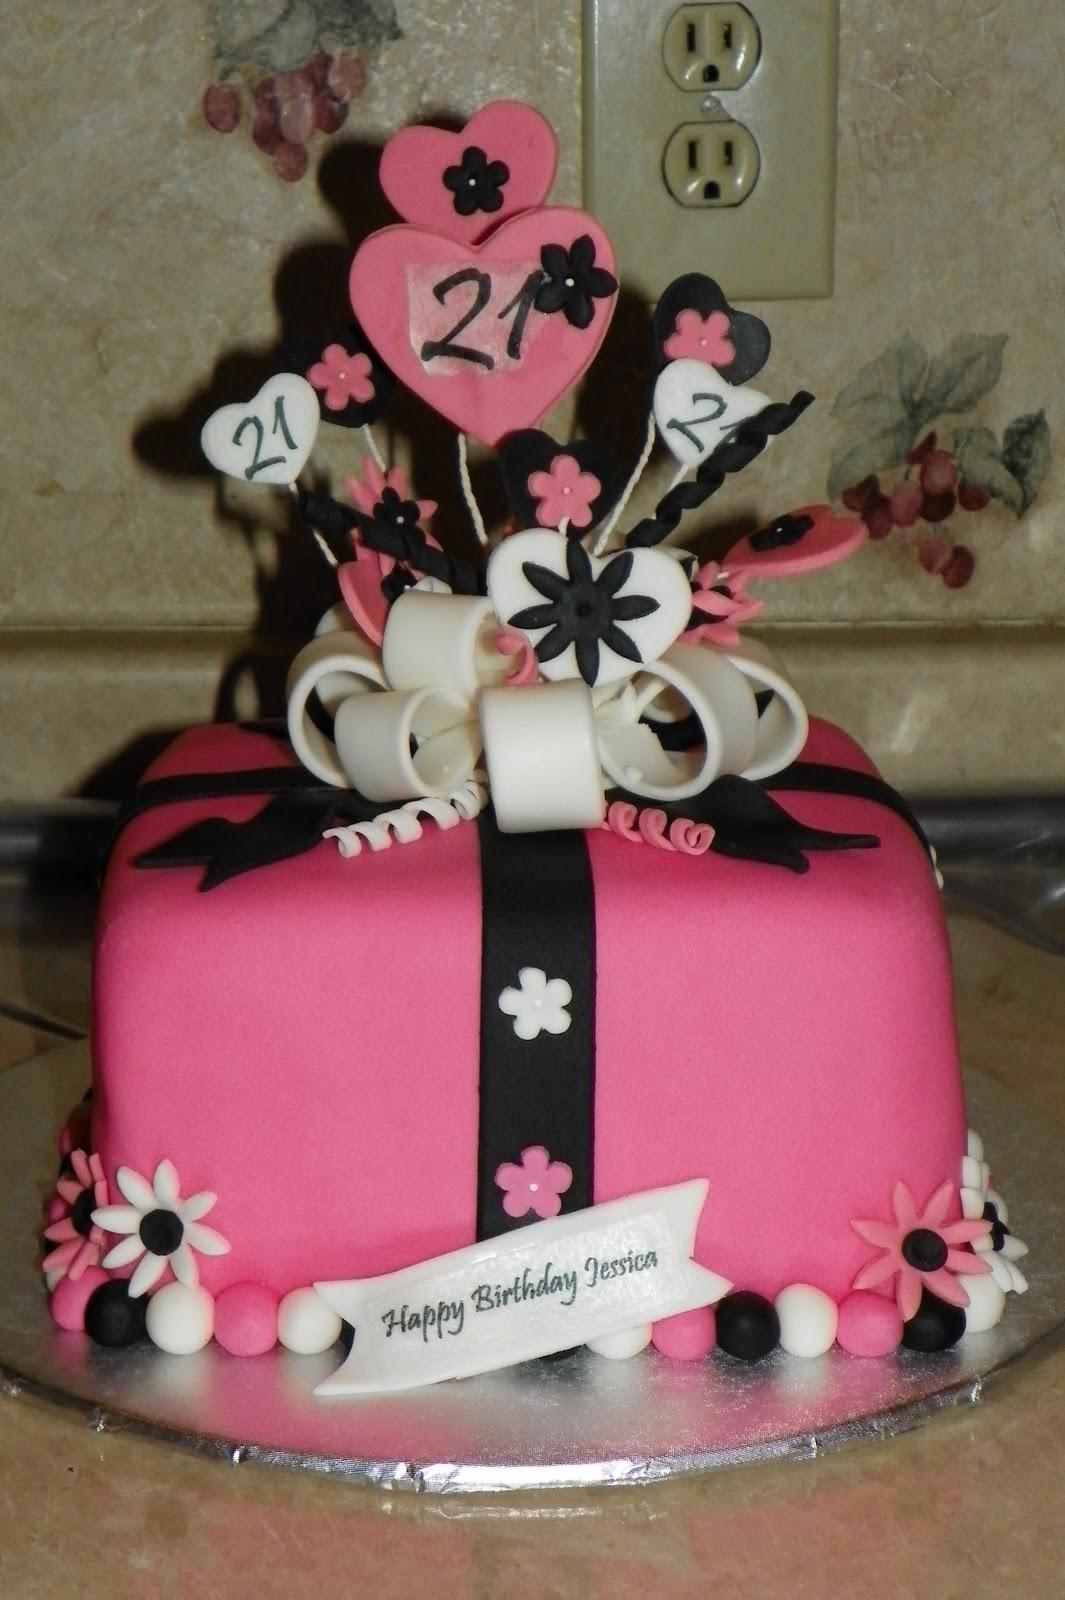 Adult Girly Fun Birthday Cakes